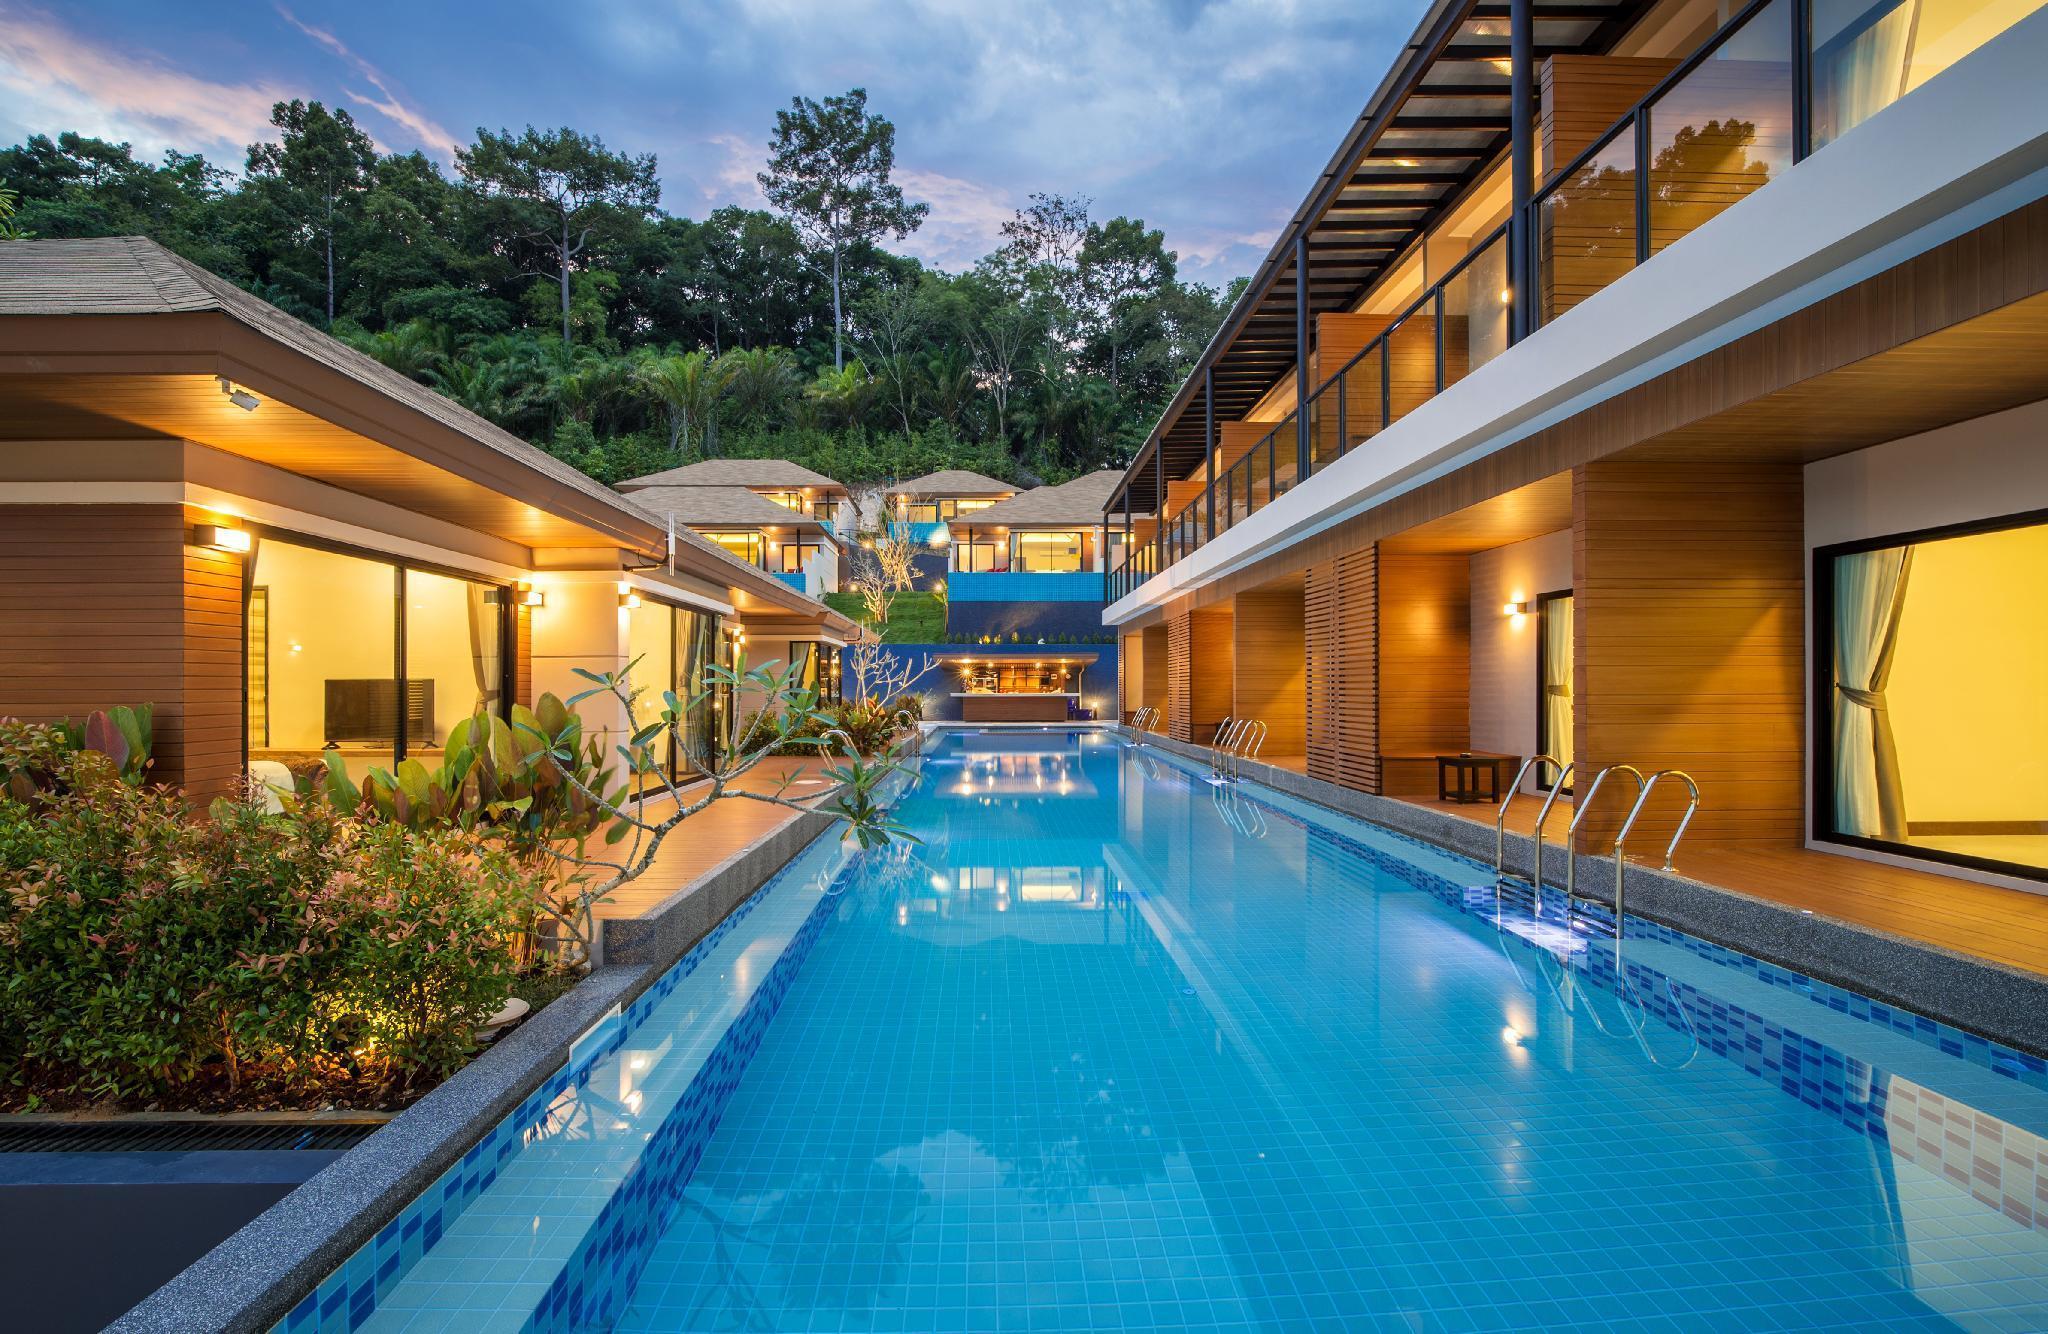 Chermantra Aonang Resort & Pool Suite เฌอมันตรา อ่าวนาง รีสอร์ท แอนด์ พลู สวีท